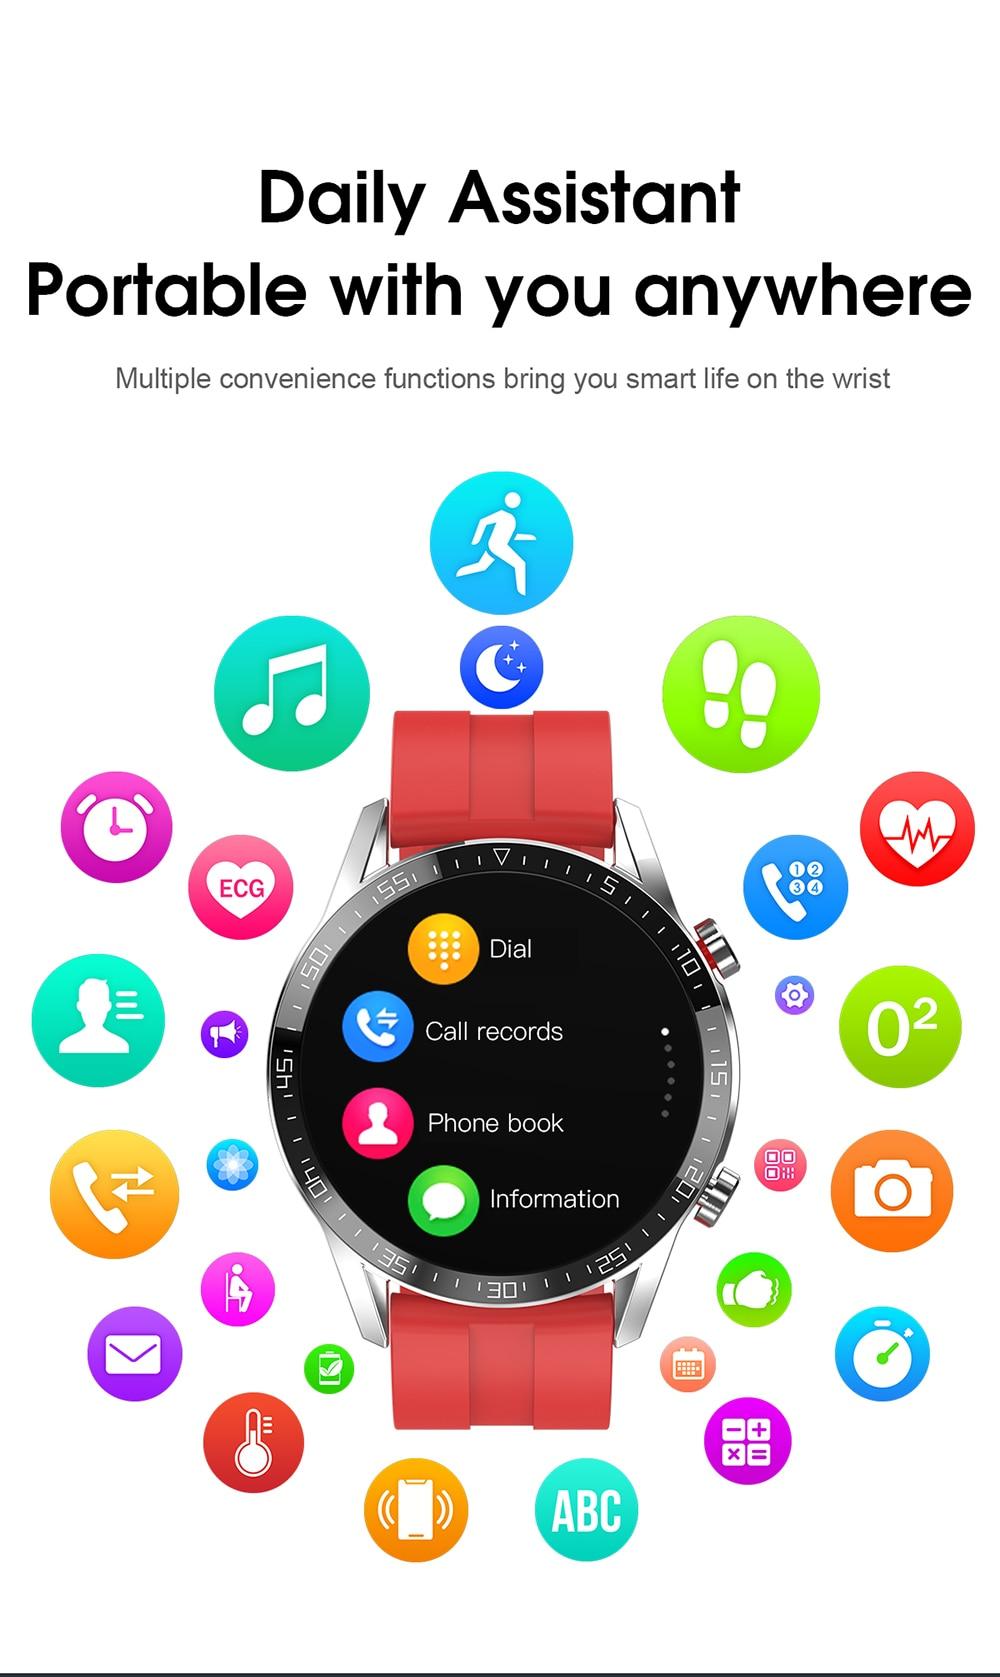 H51aeba20303c4f35a45e85c894e0ce743 For Phone Xiaomi Android IOS Reloj Inteligente Hombre Smartwatch Men 2021 Android IP68 Smartwatch Answer Call Smart Watch Man